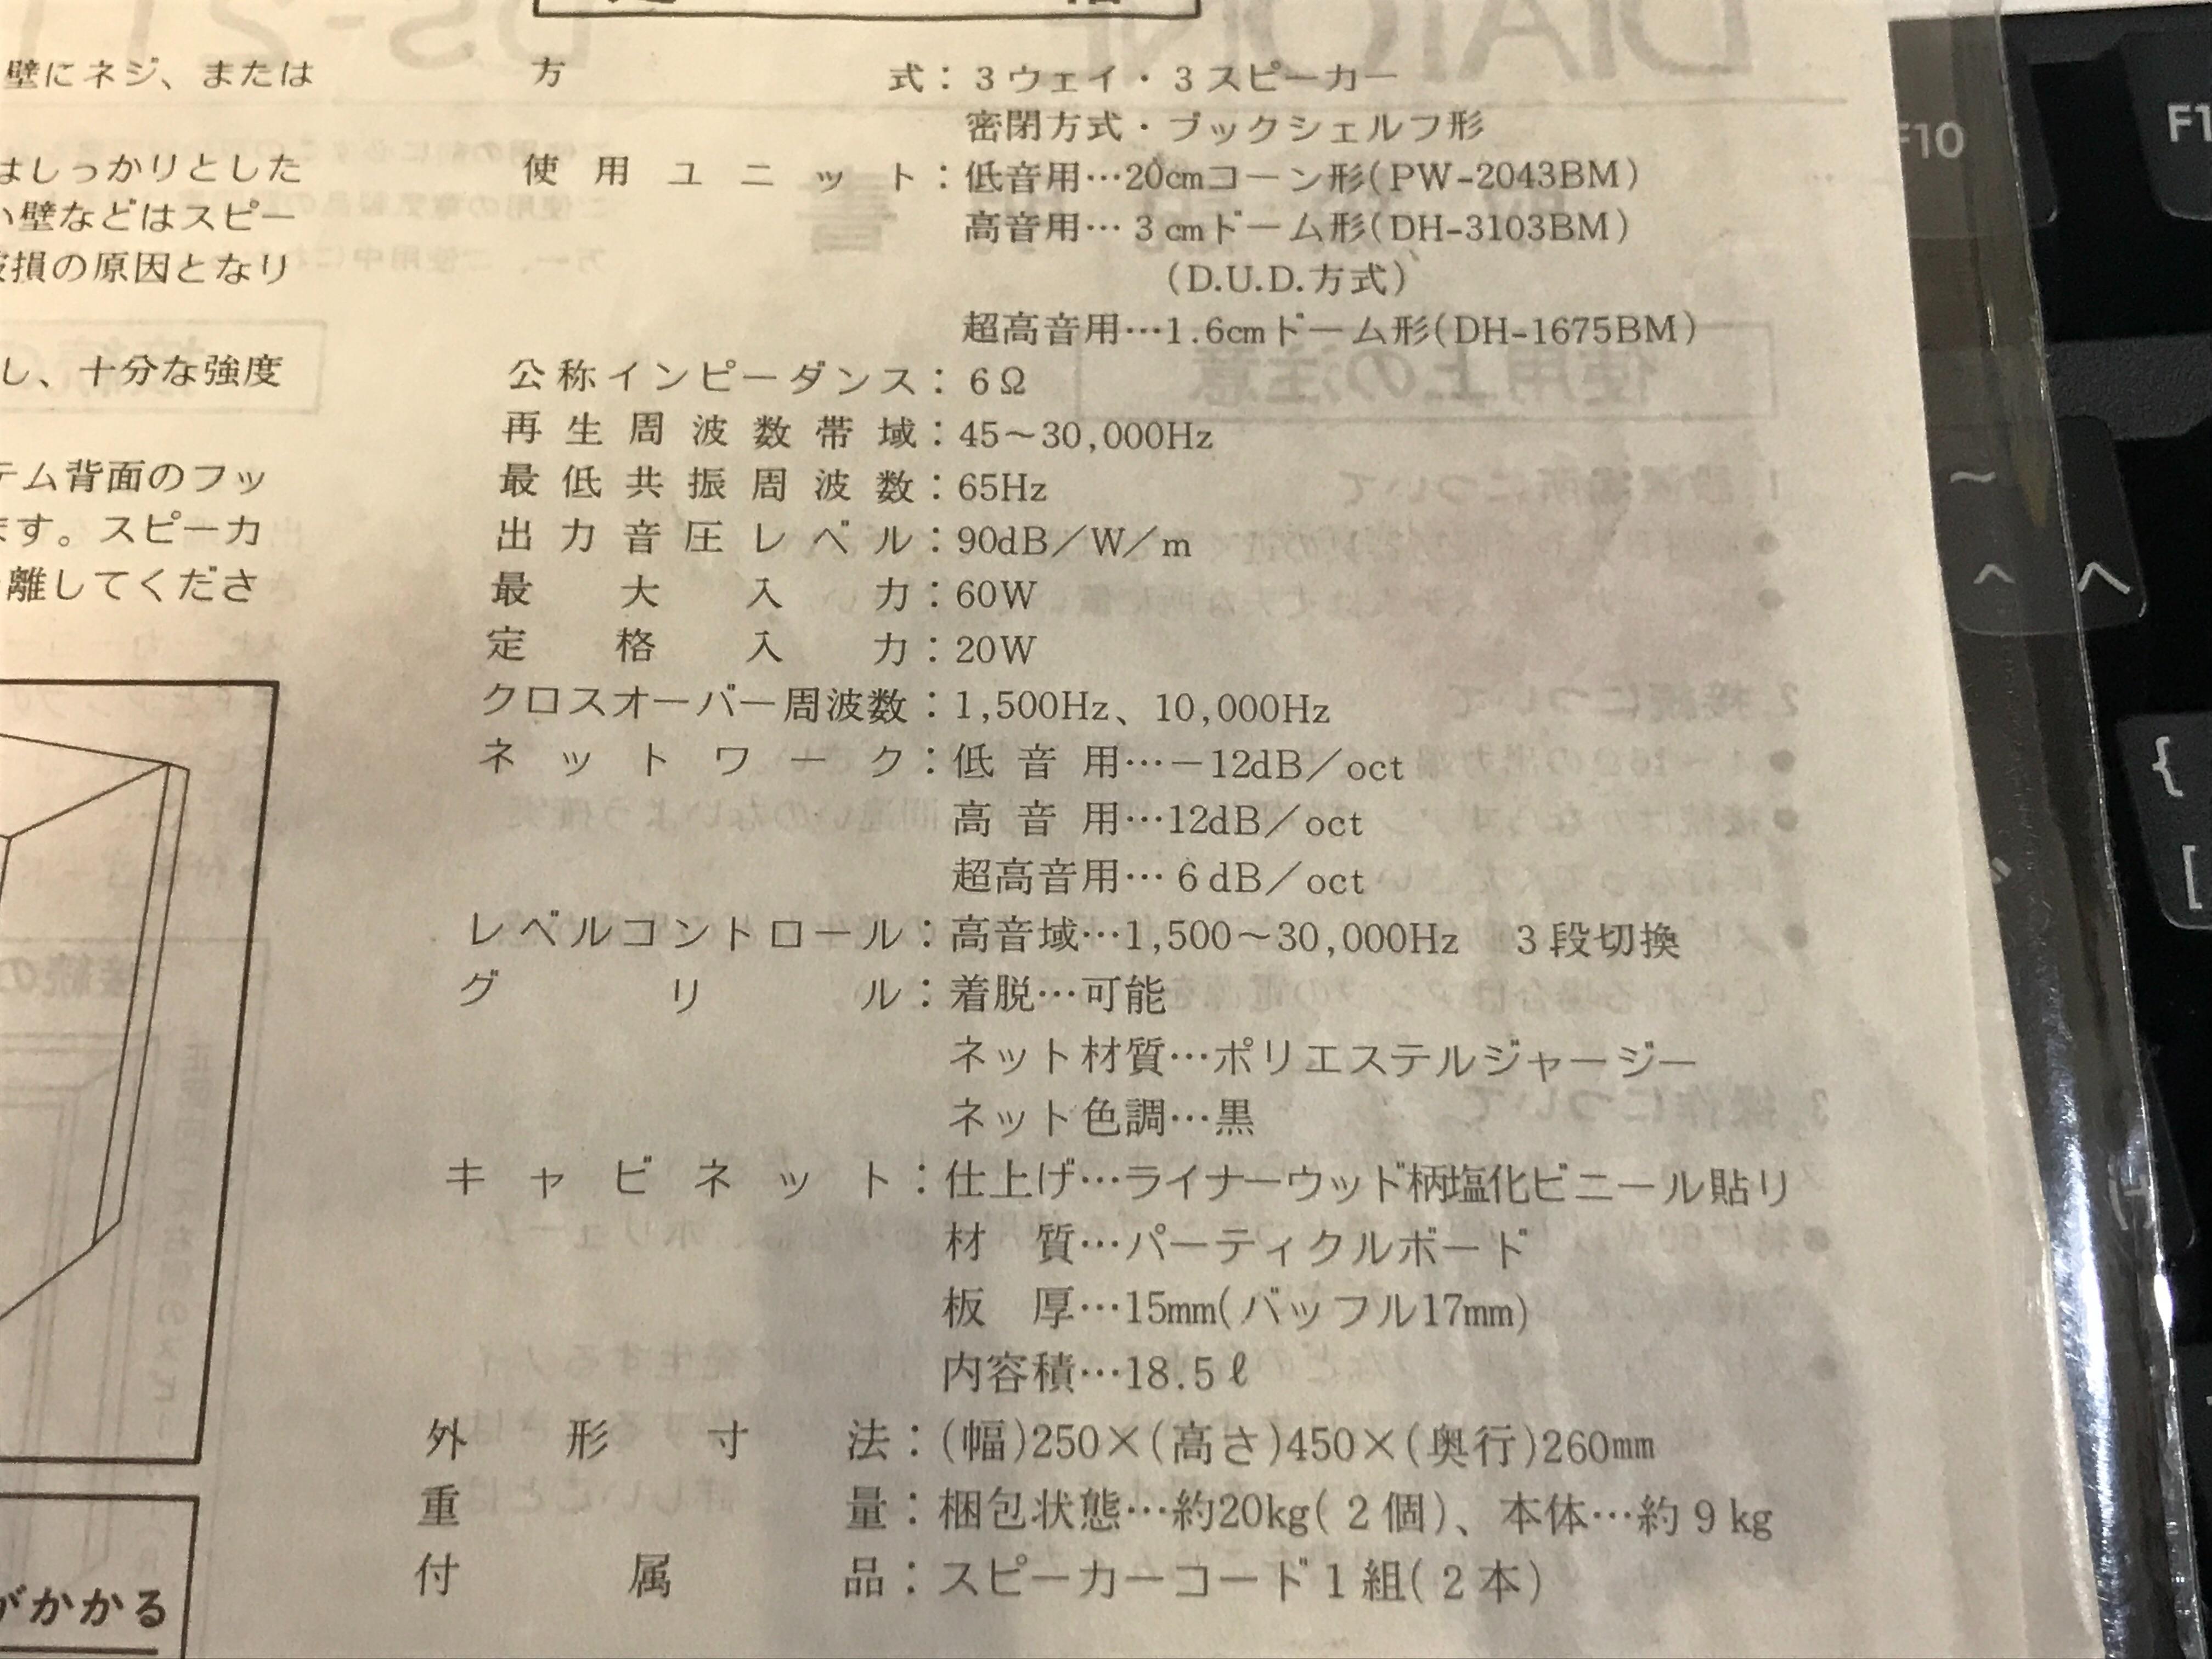 f:id:SeisoSakuya:20210504224442j:plain